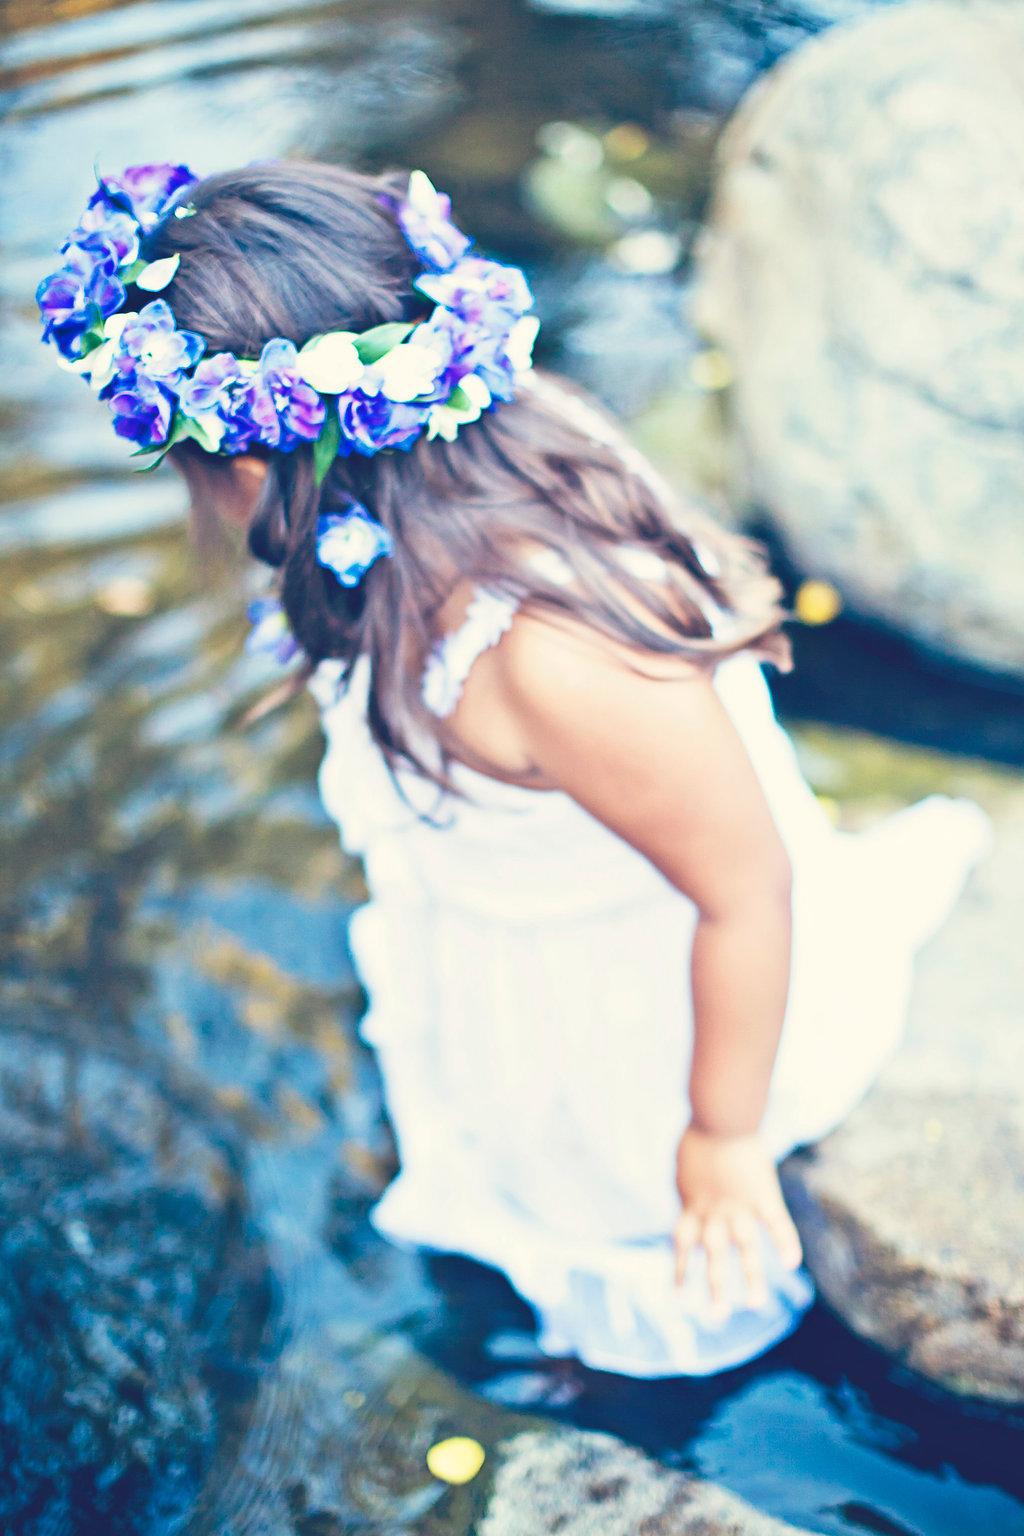 Flower g  irl crown by San Diego florist, Compas  s Fl  oral.